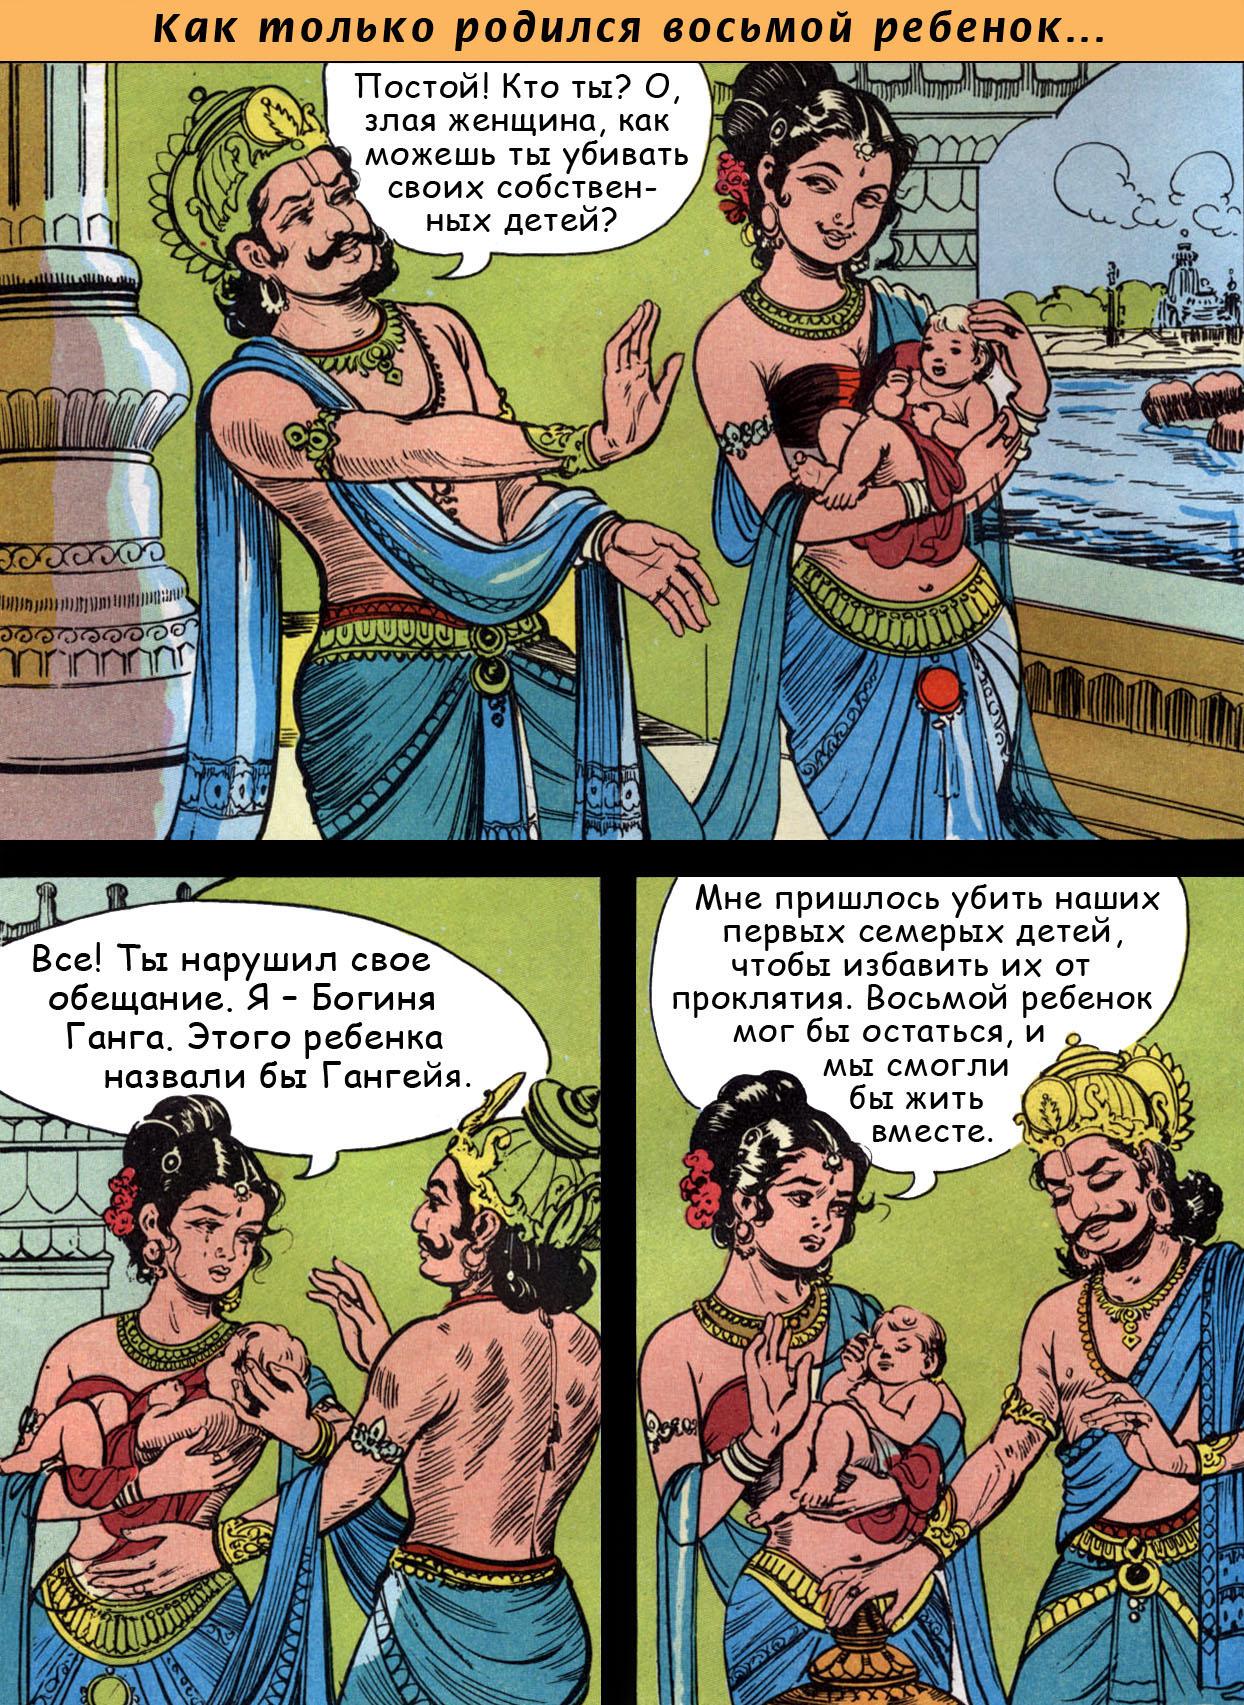 Бхишма 04 - ведический комикс